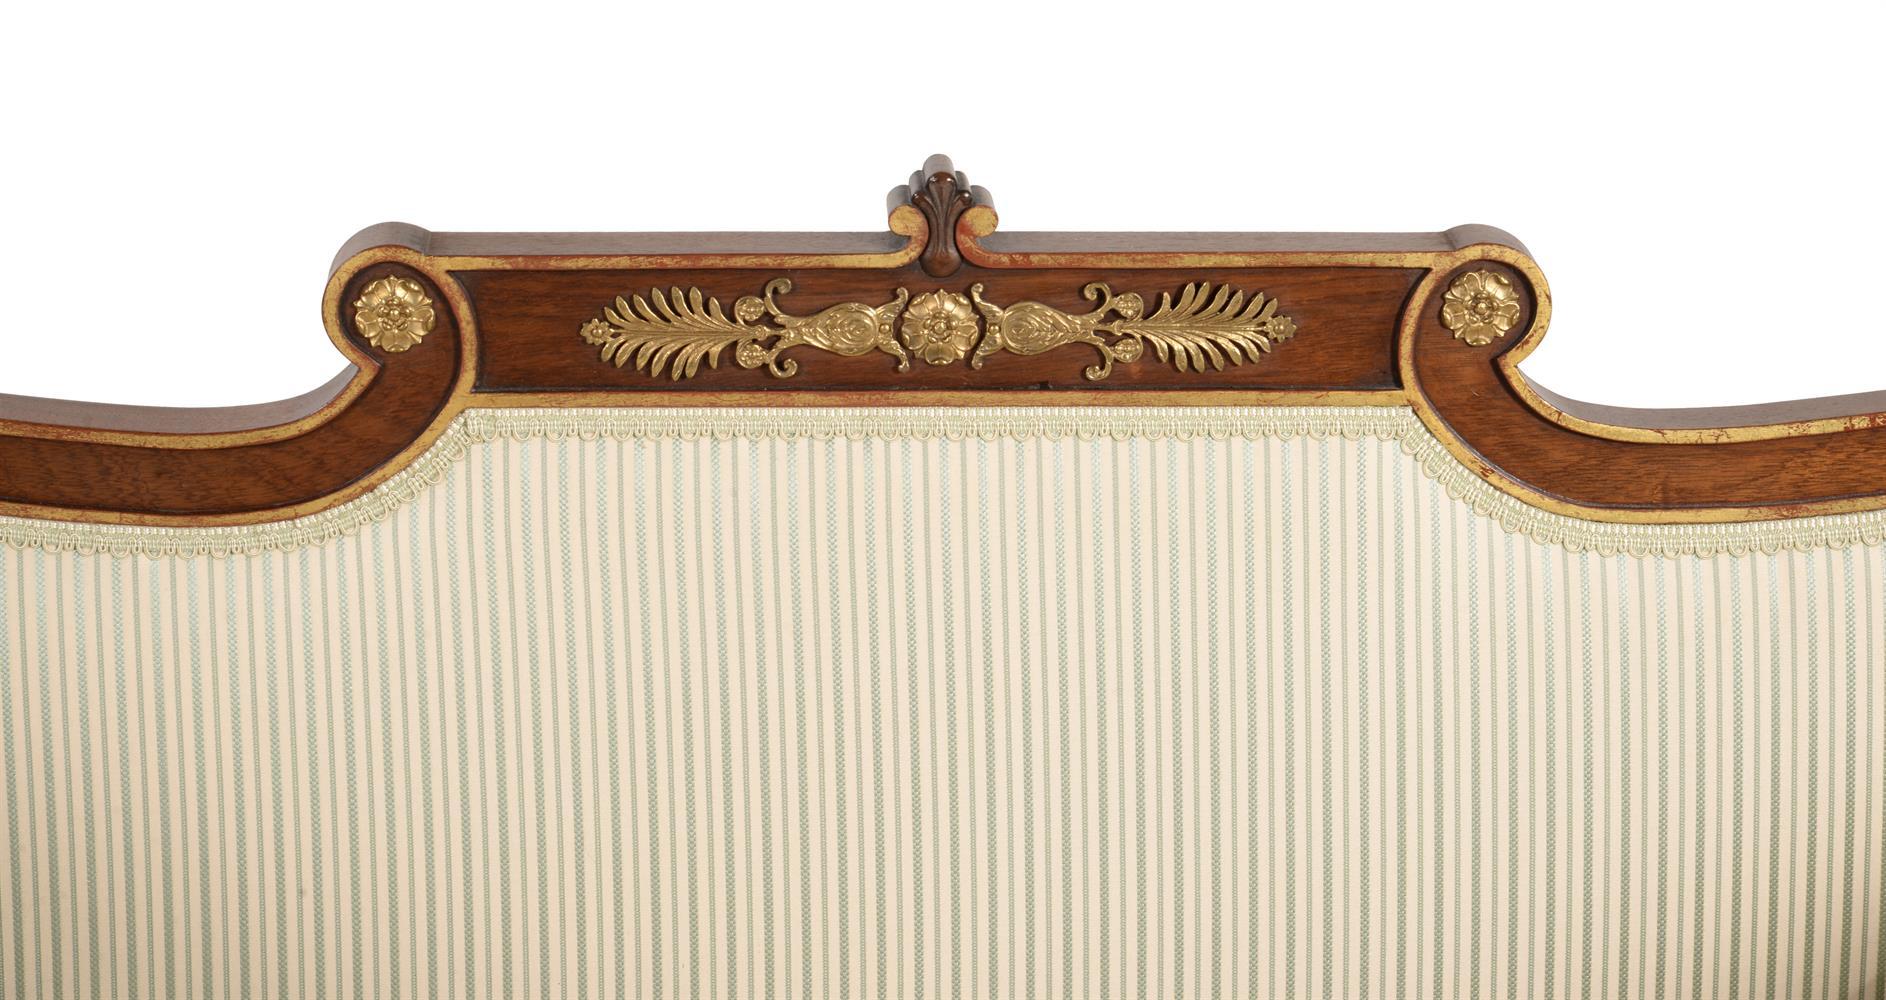 A mahogany and parcel gilt sofa - Image 3 of 6